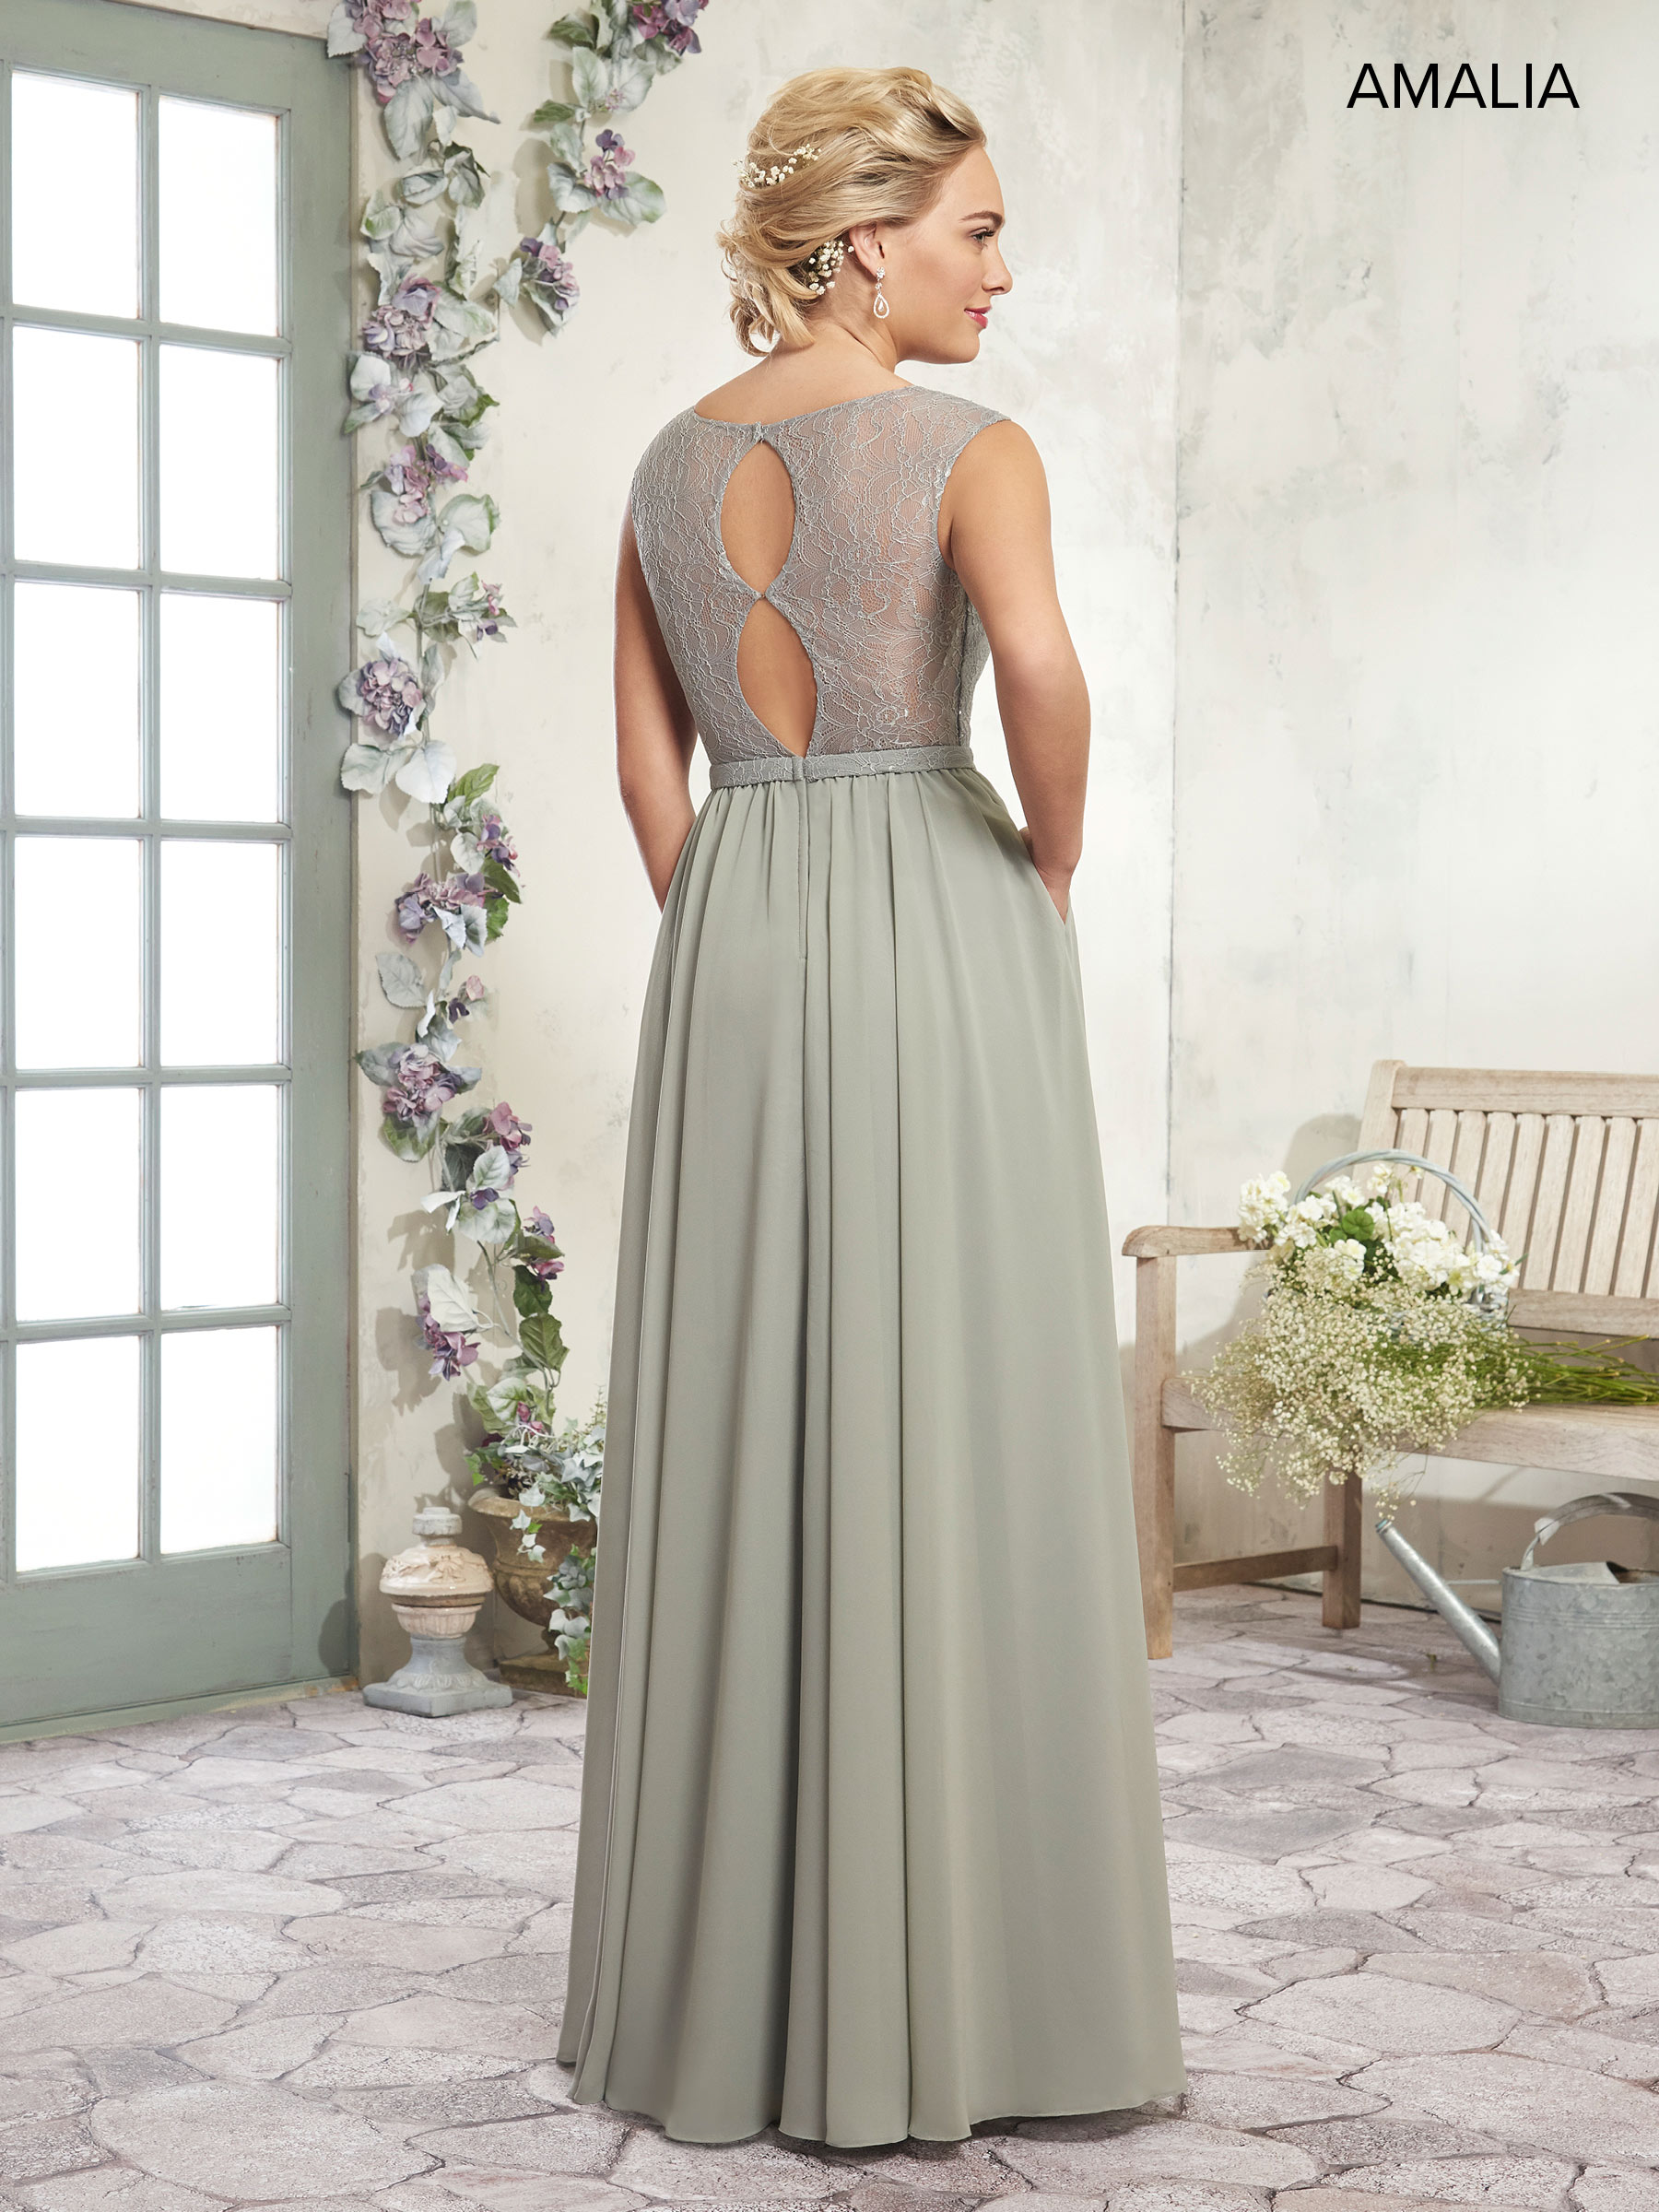 Amalia Bridesmaid Dresses | Amalia | Style - MB7019